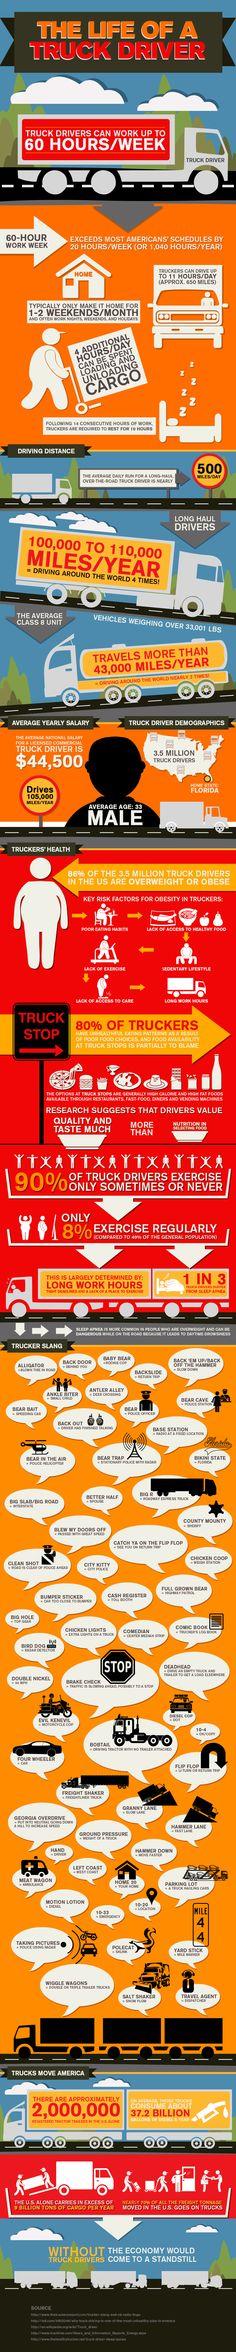 The Life of a Truck Driver | NextTruck Blog & Industry News - Trucker Information